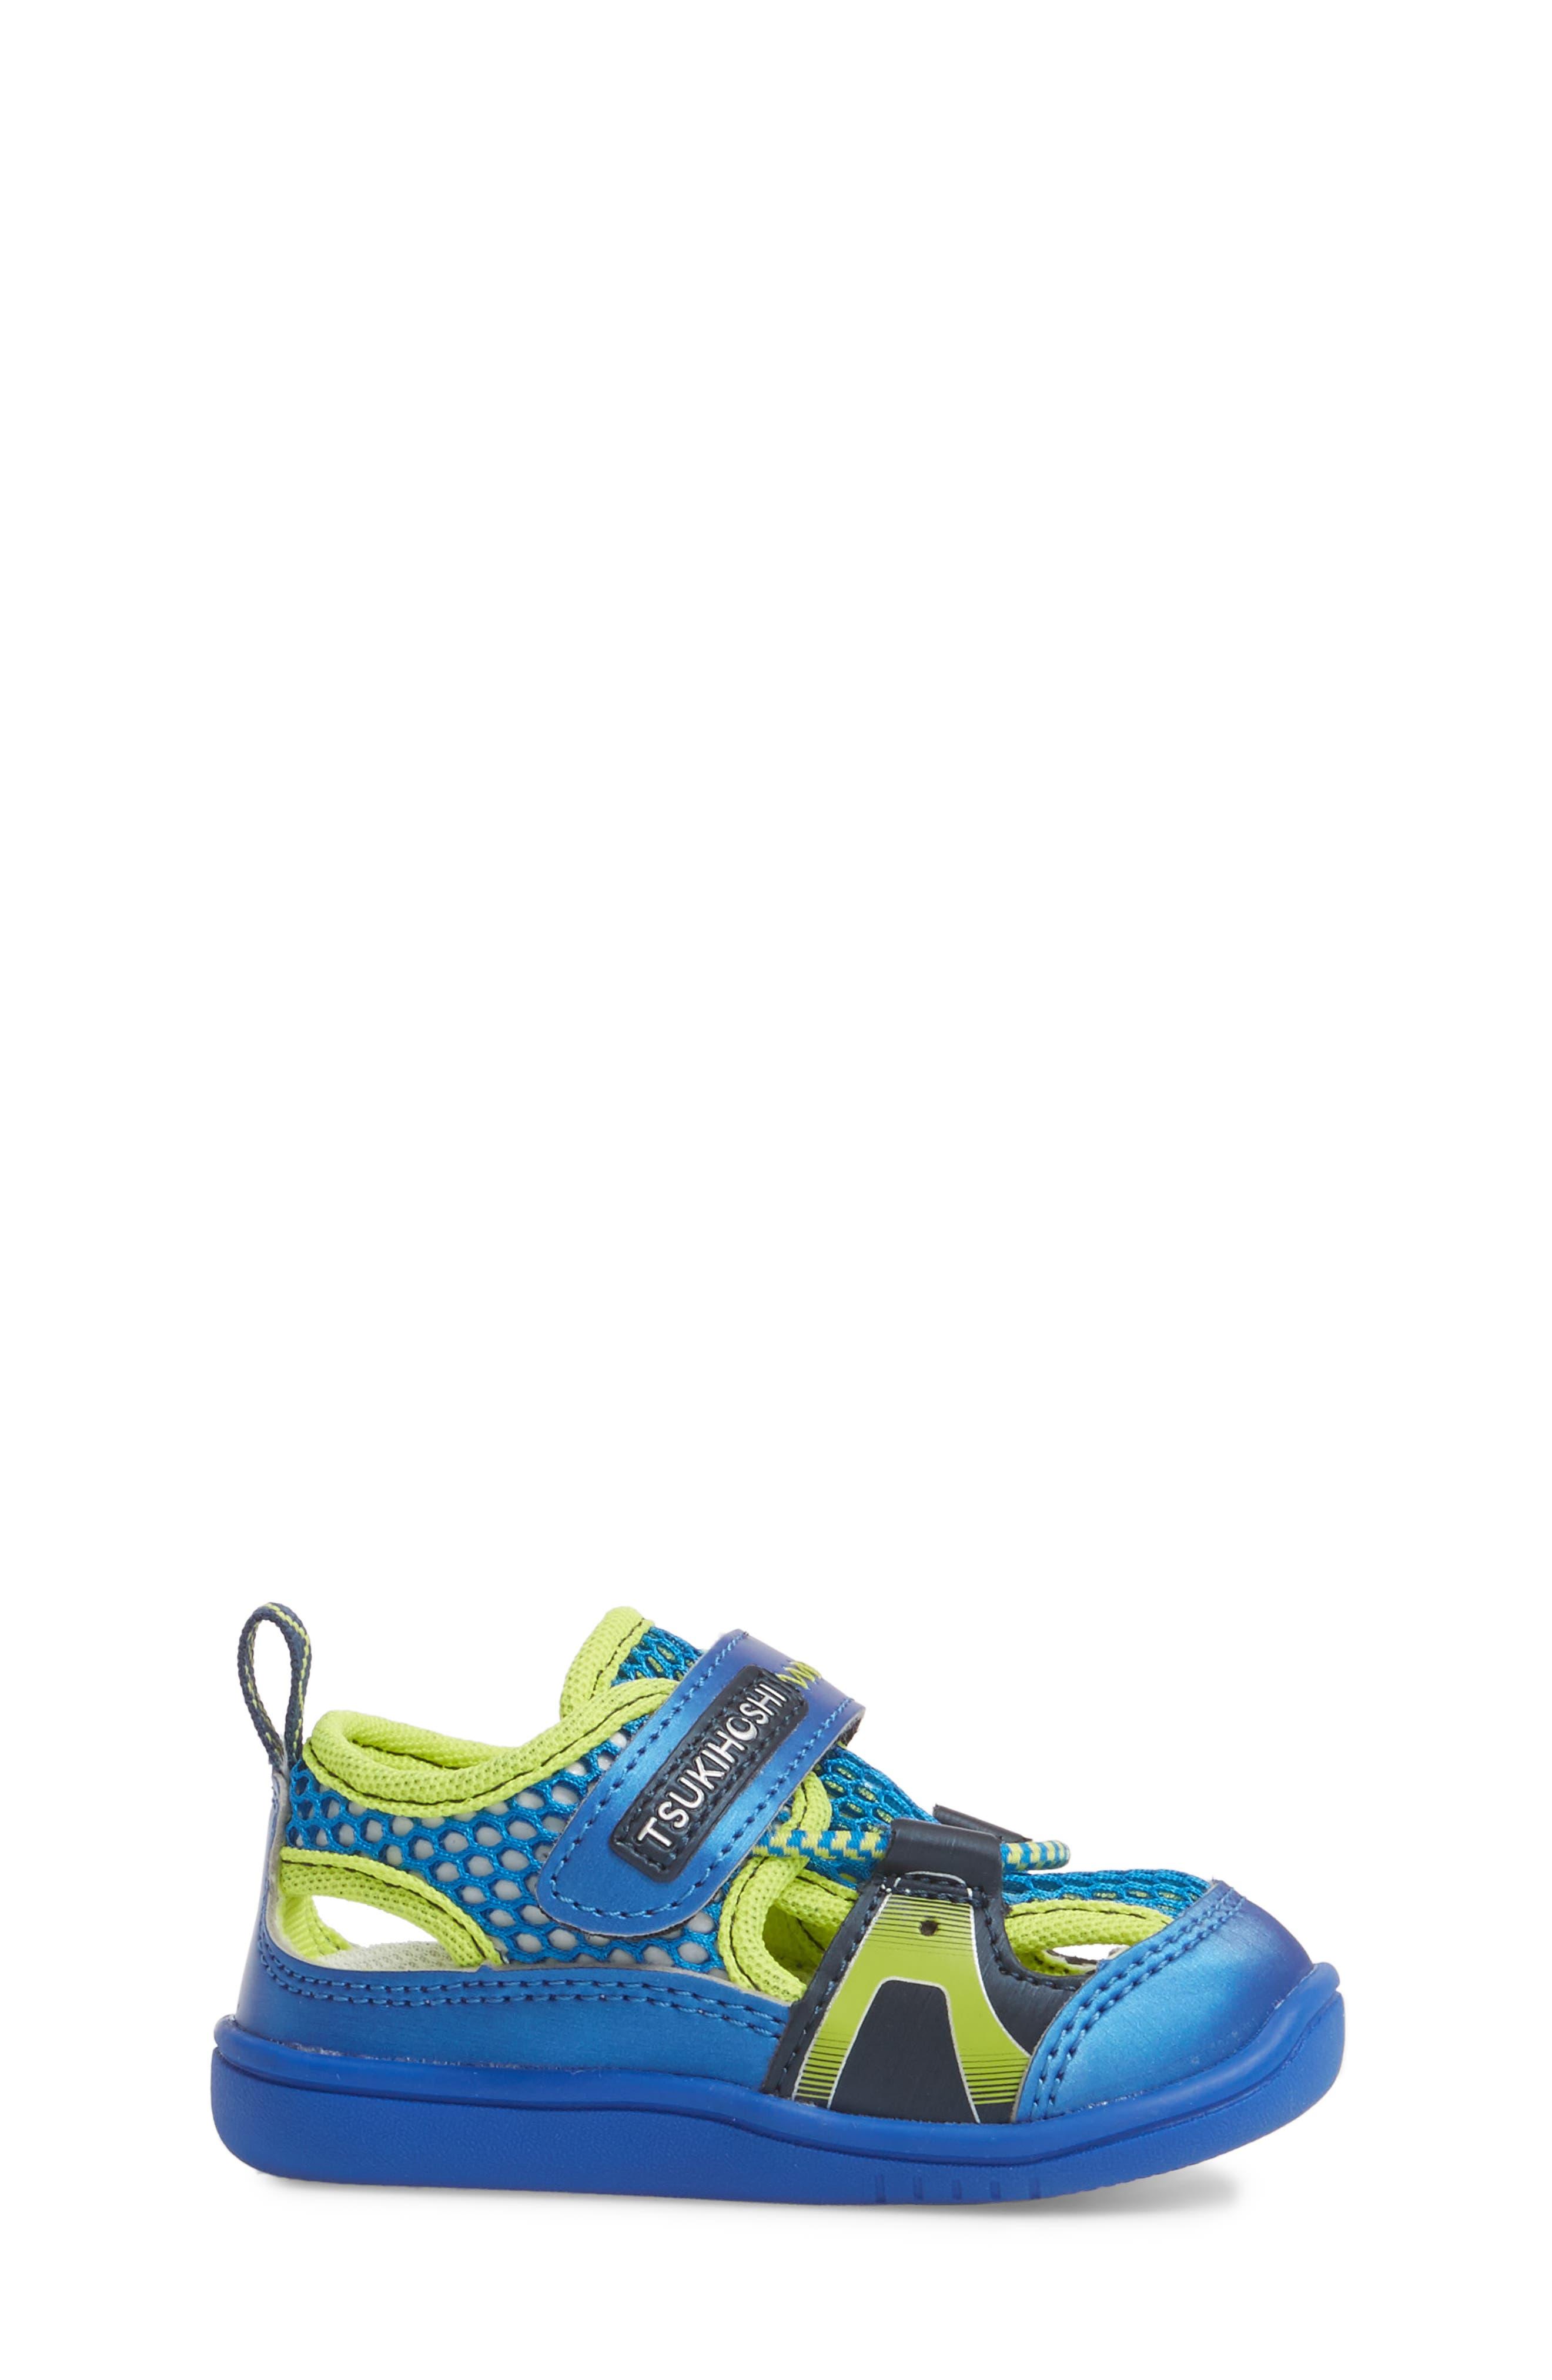 Ibiza Washable Sandal,                             Alternate thumbnail 3, color,                             Royal/ Lime